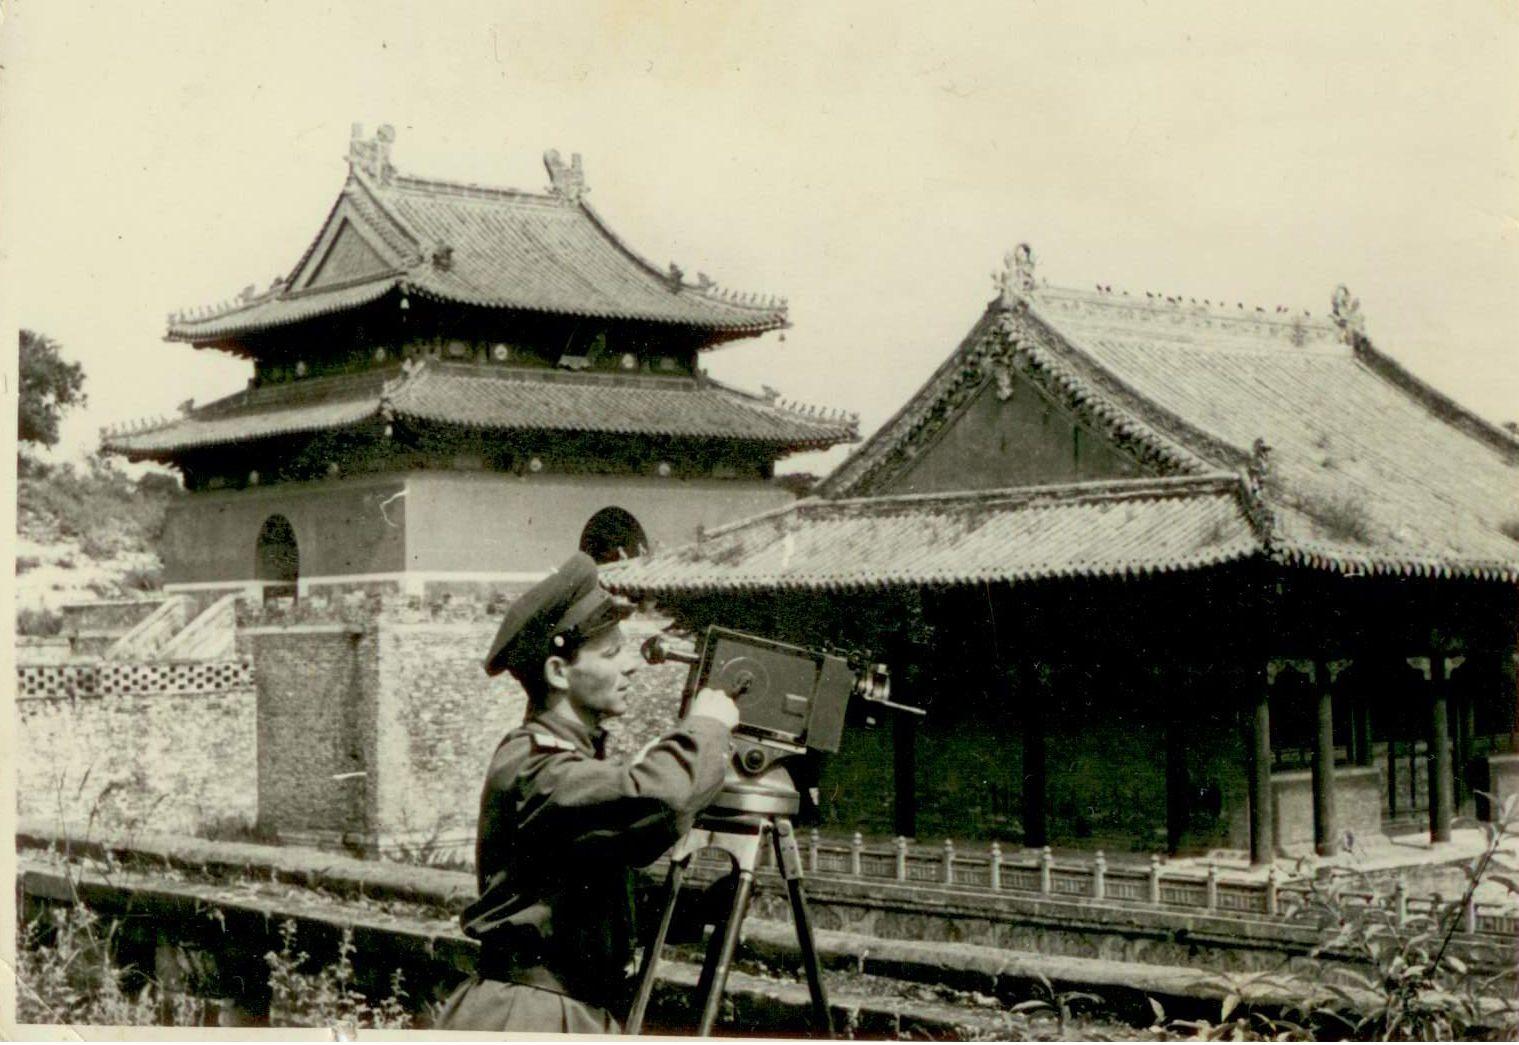 Мукден, Маньчжурия. Сентябрь 1945 года